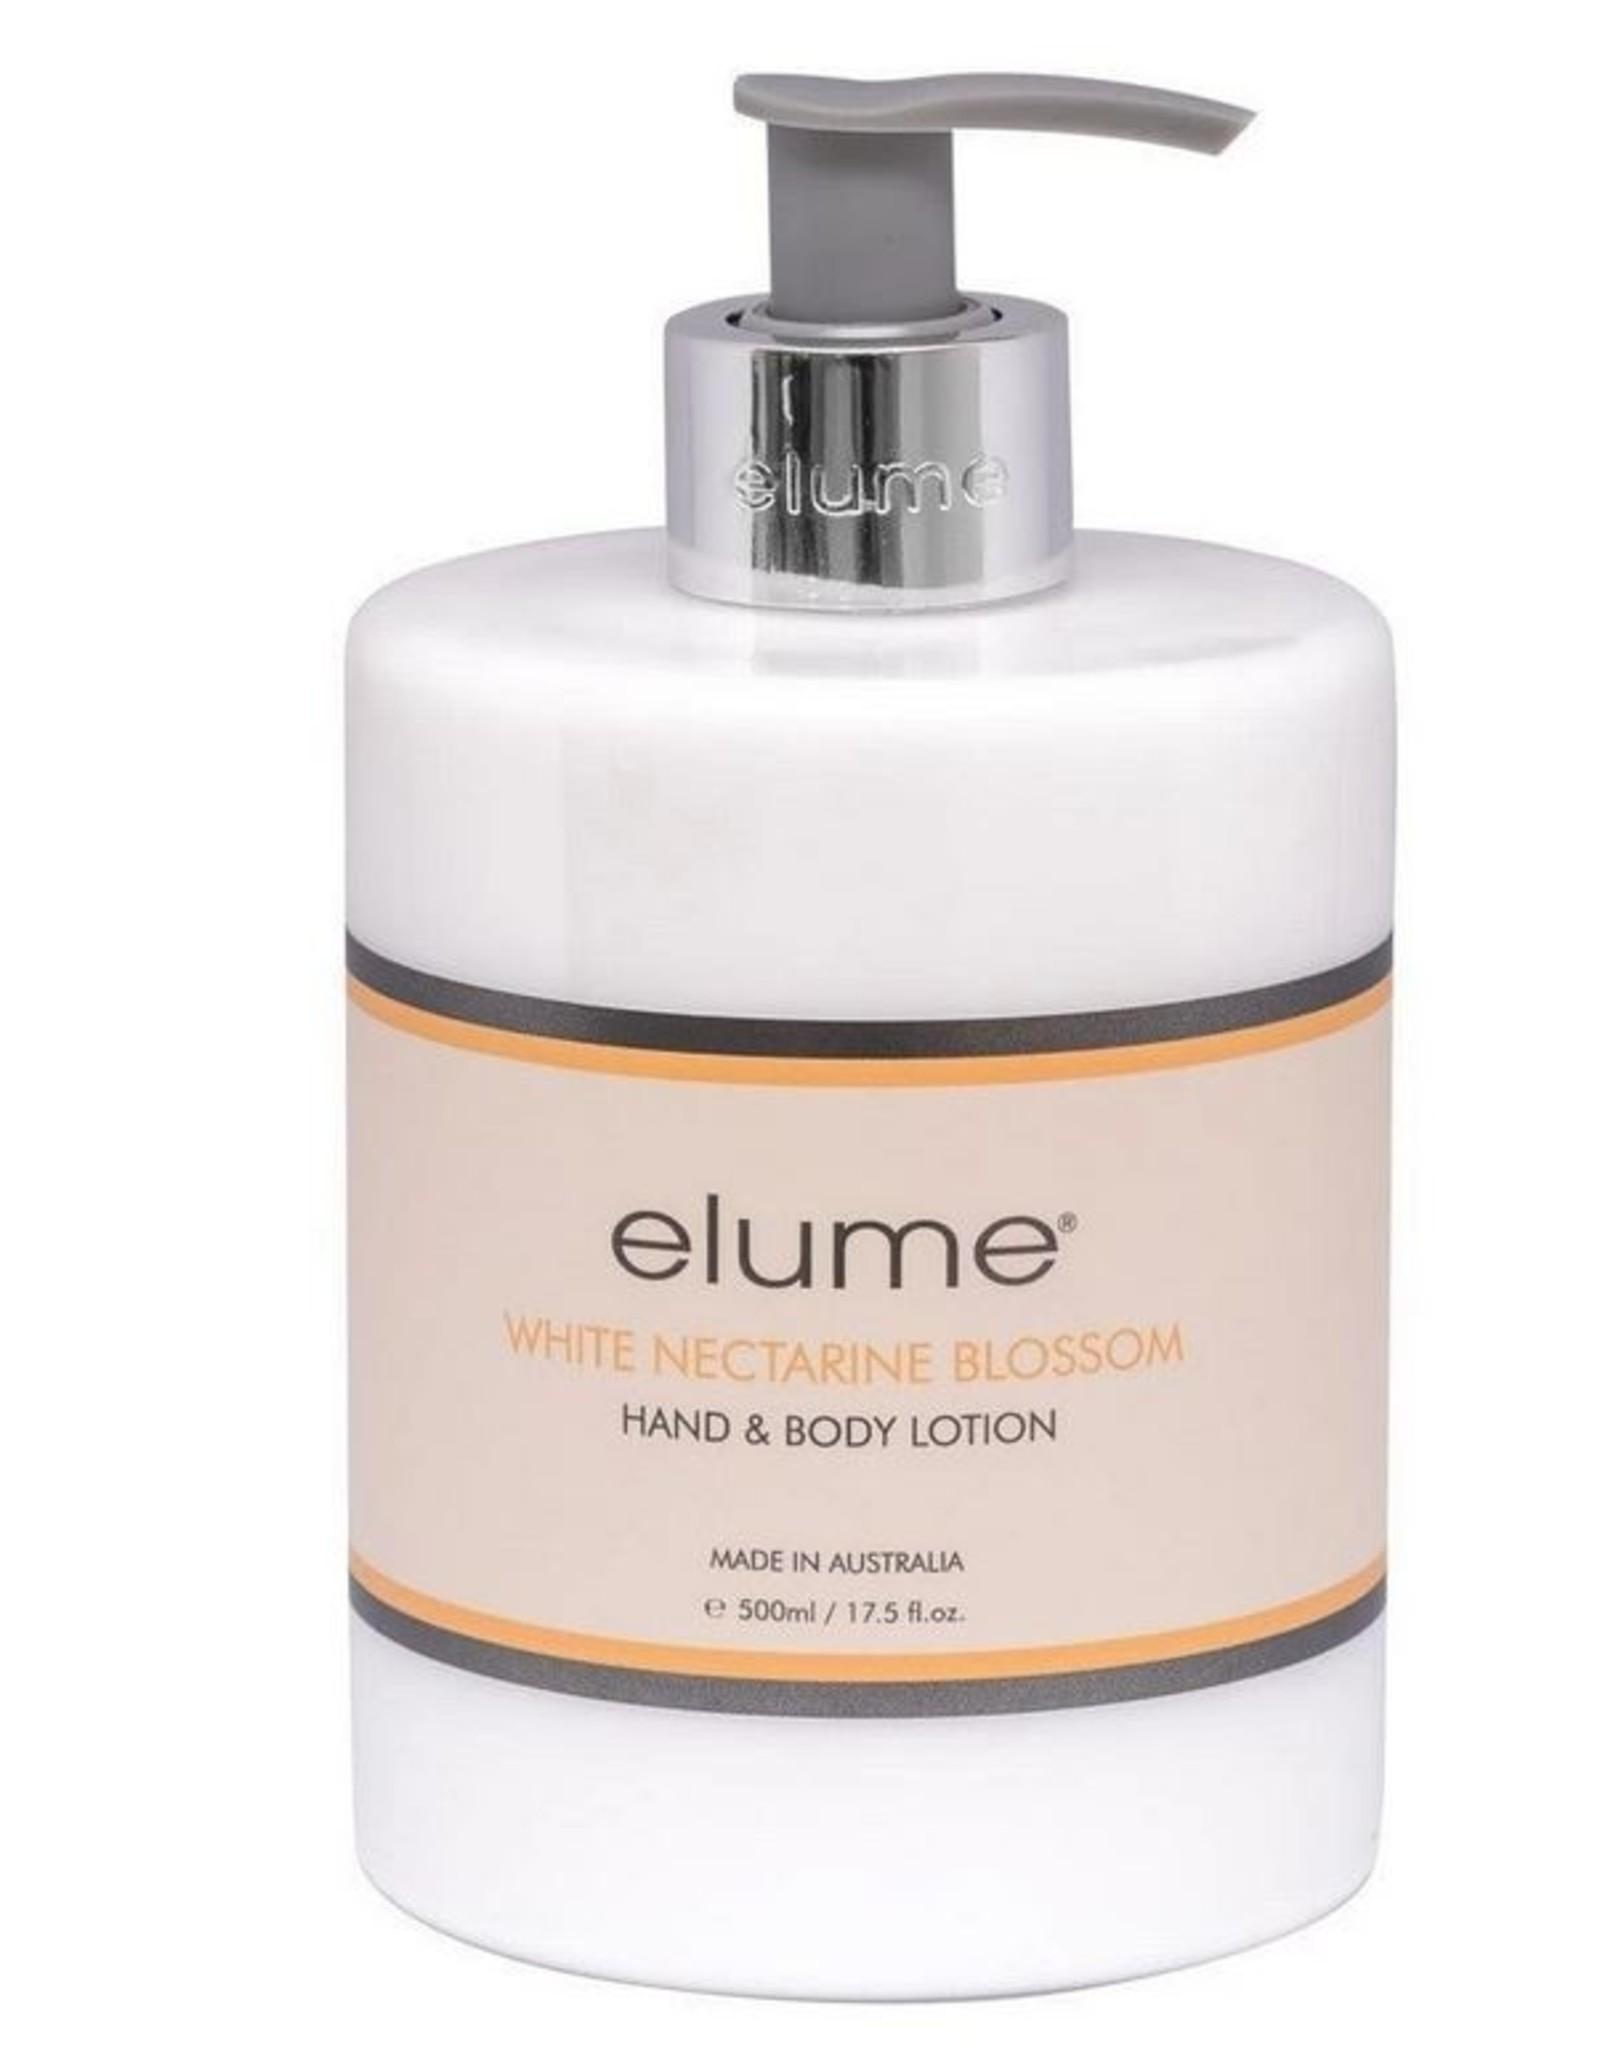 Elume Elume Hand & Body Lotion 500ml